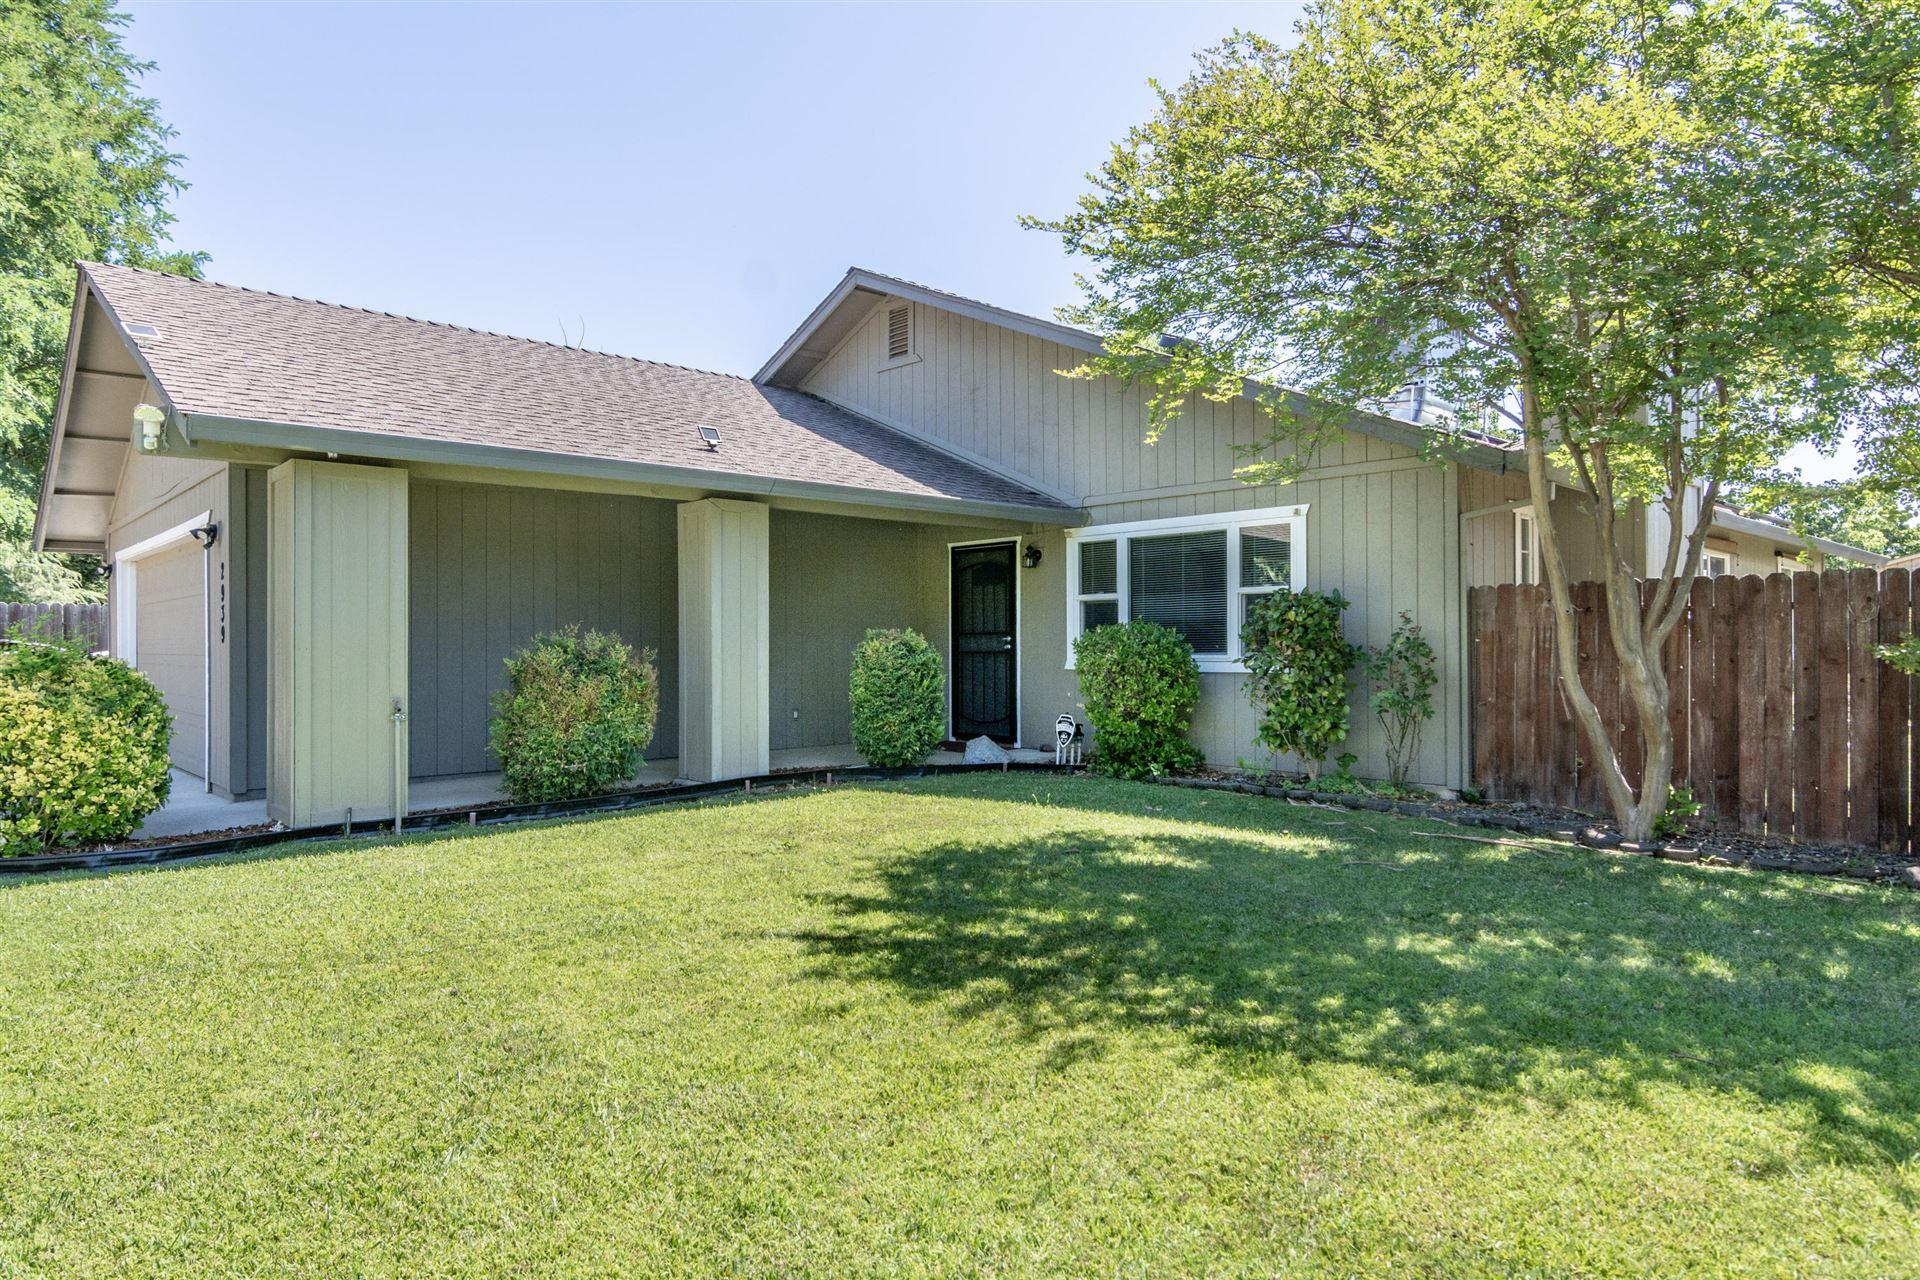 2939 Dove St, Redding, CA 96001 - MLS#: 20-3310